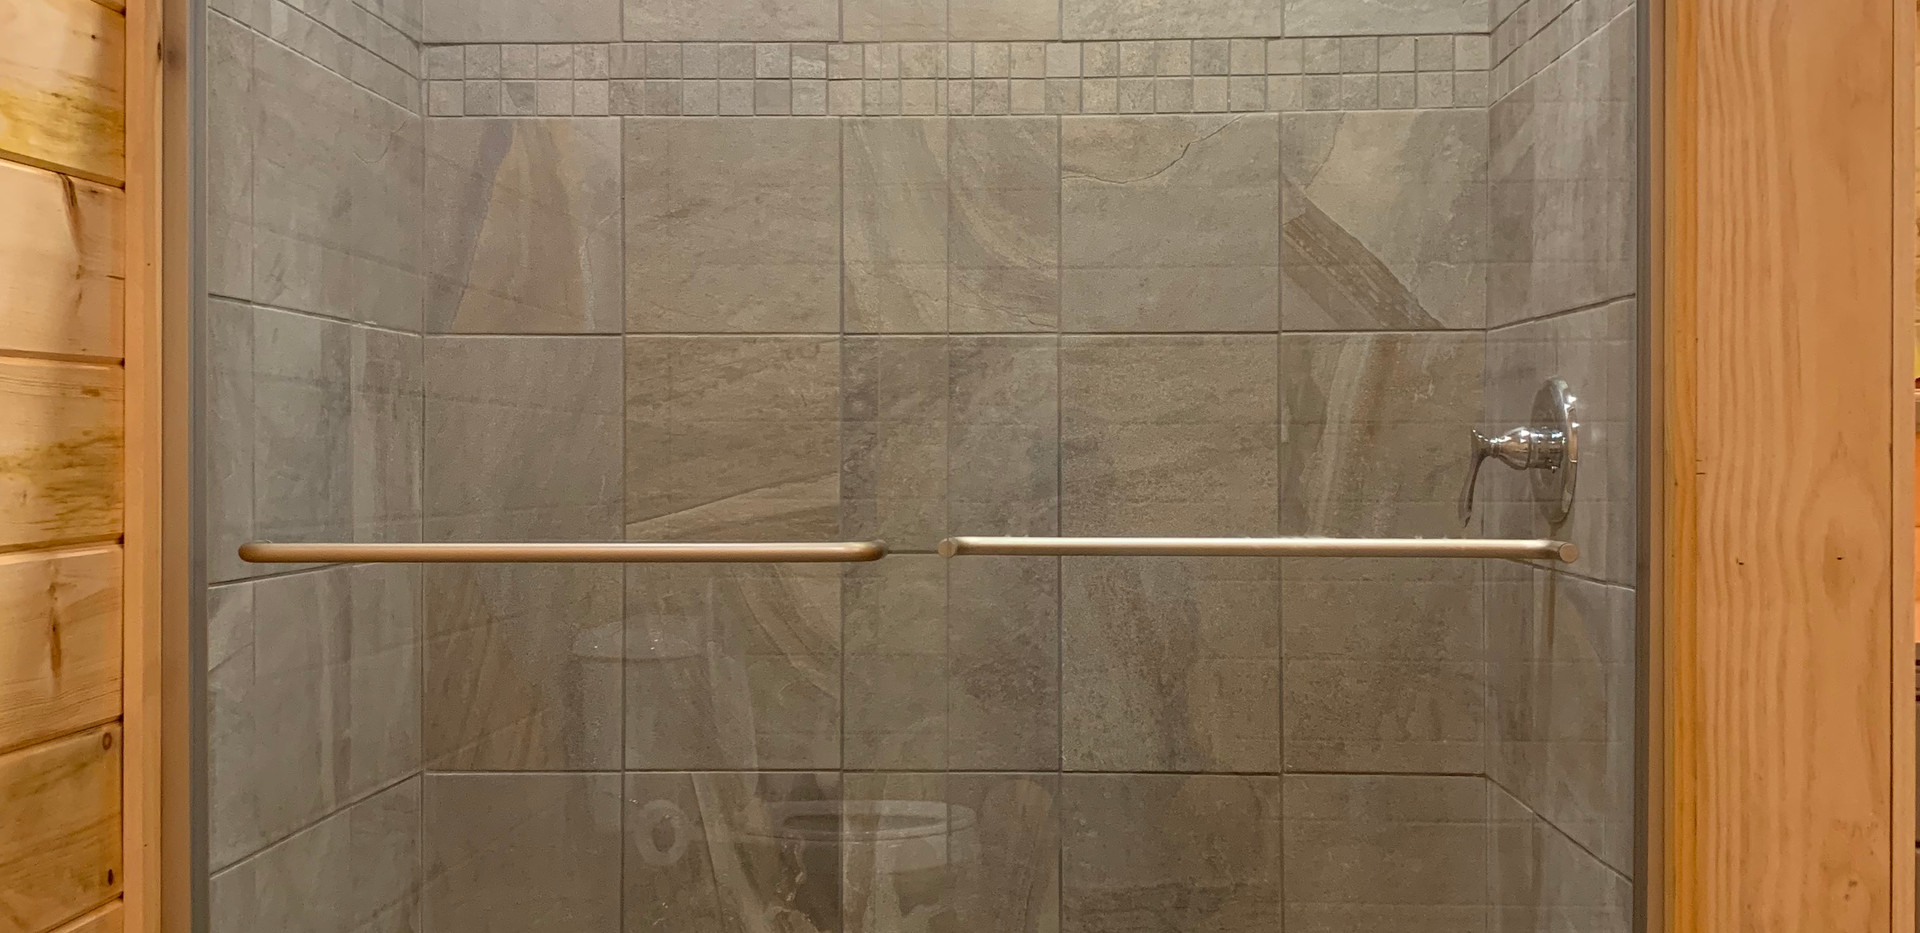 Rainfall Shower in Basement Master Bathroom